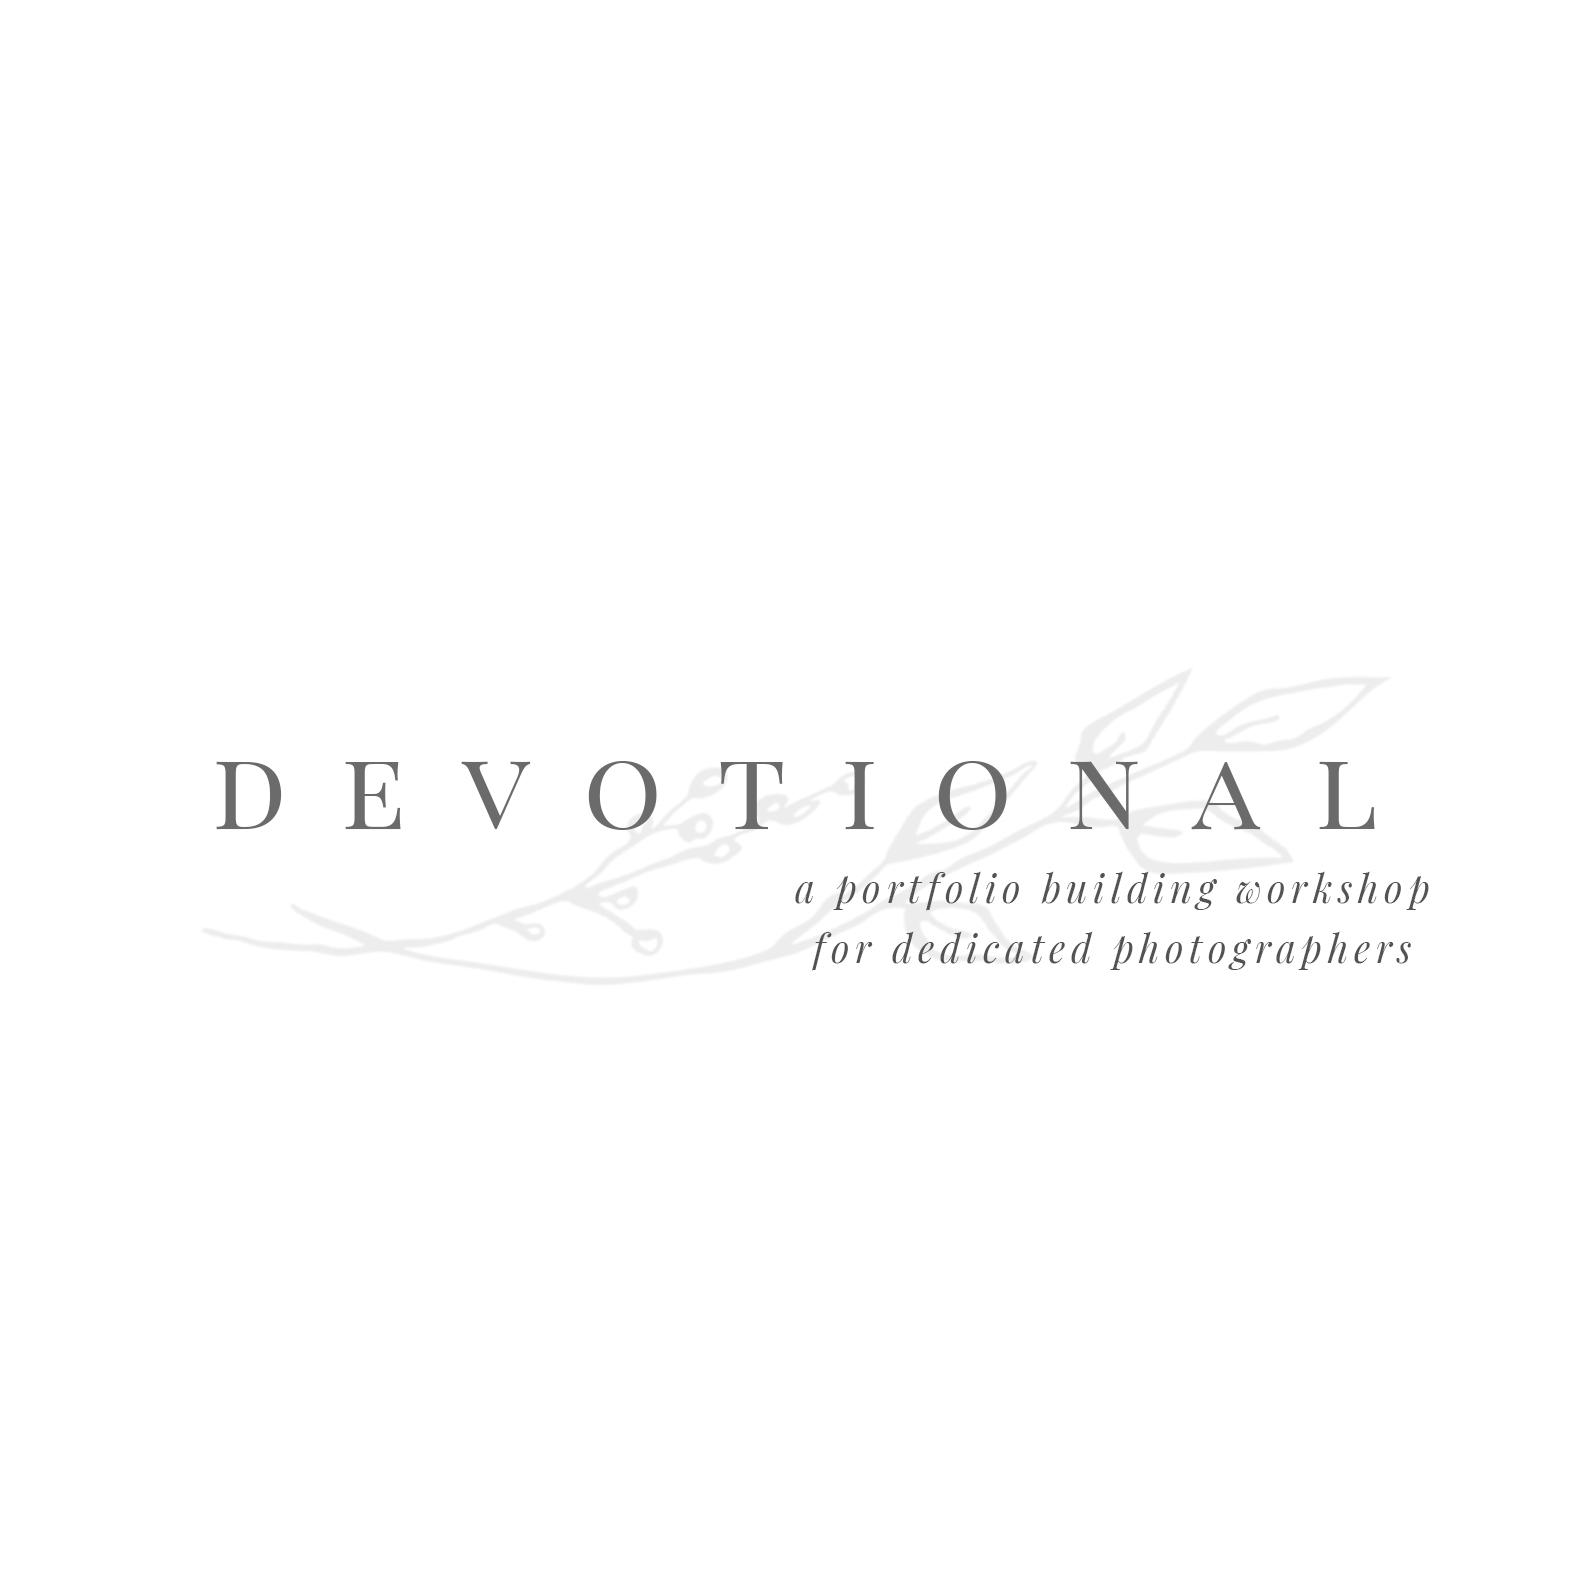 devotional_logo.jpg